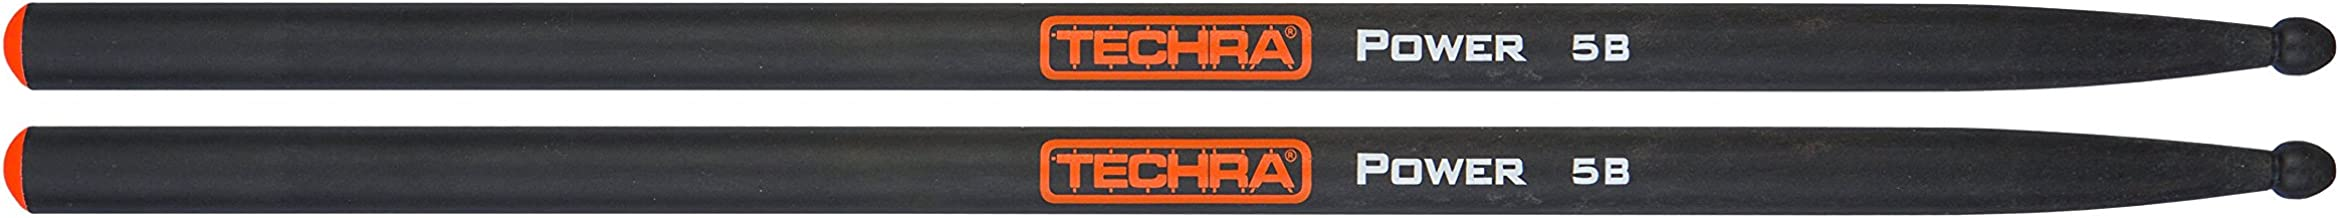 TECHRA POWER 5B ドラムスティック